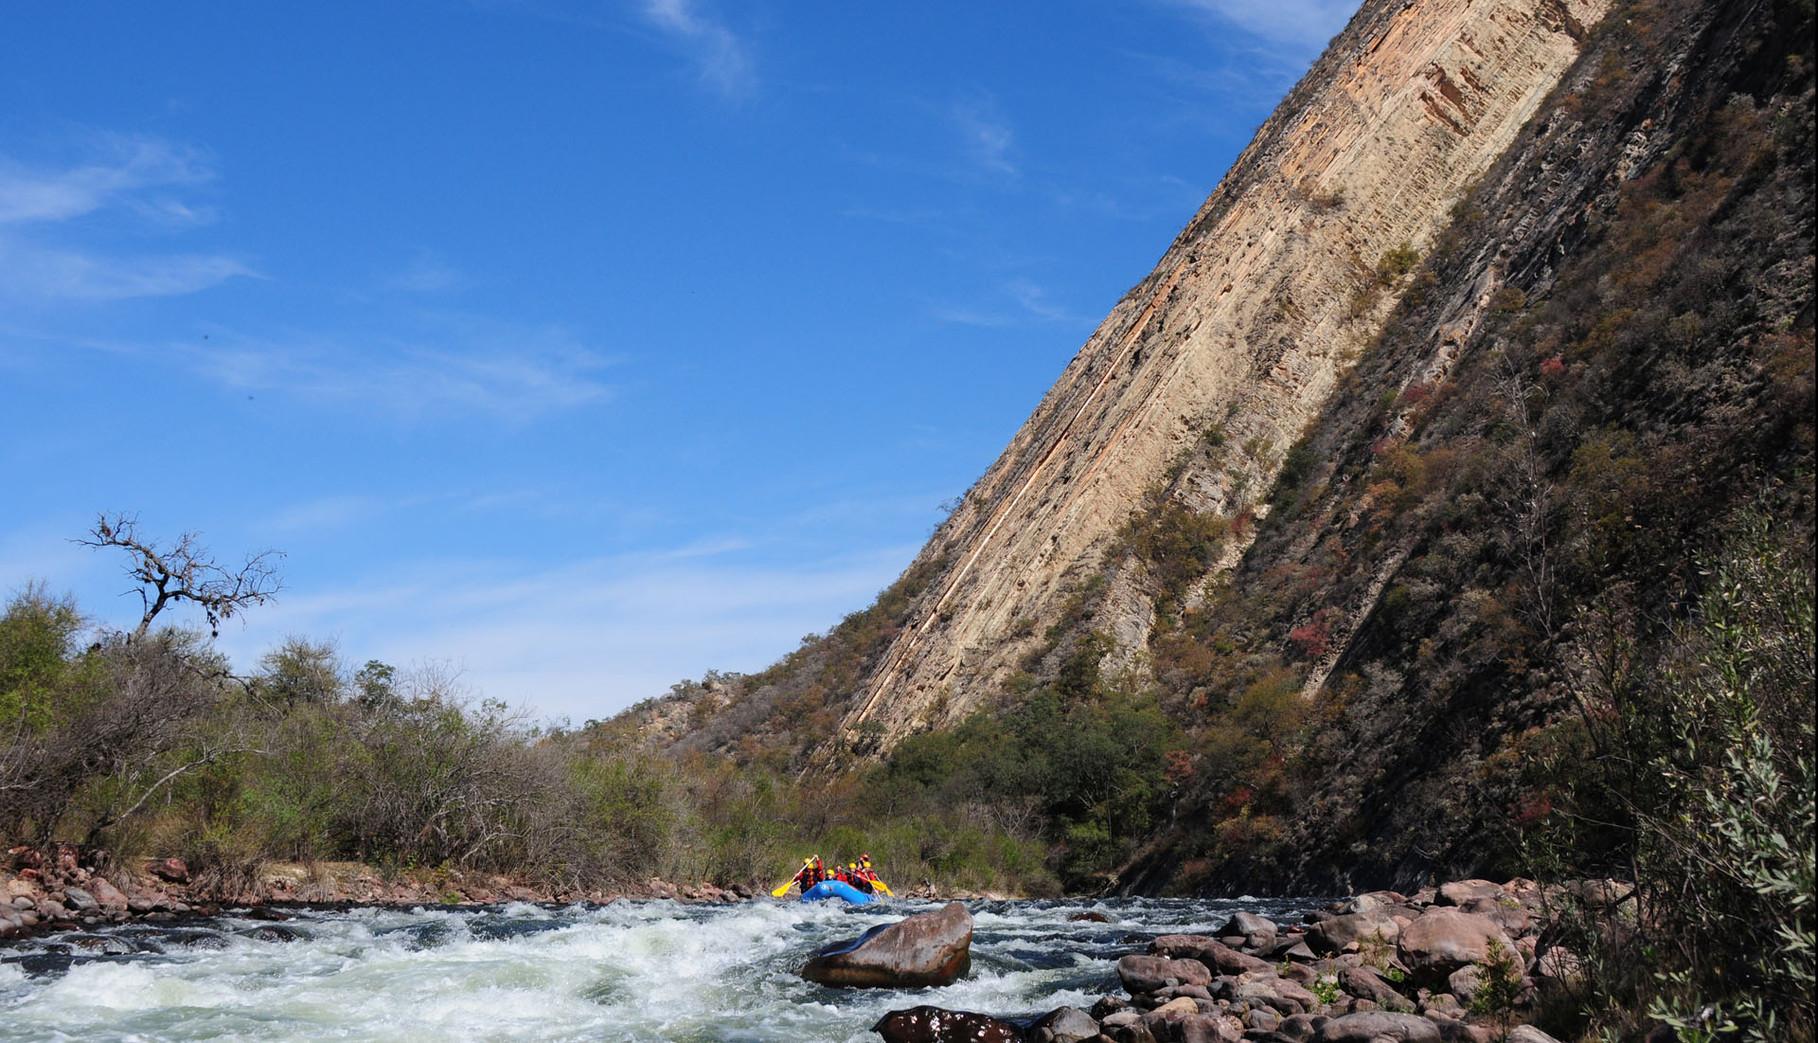 River rafting Rio Juramento, Salta [Argentina, 2014]